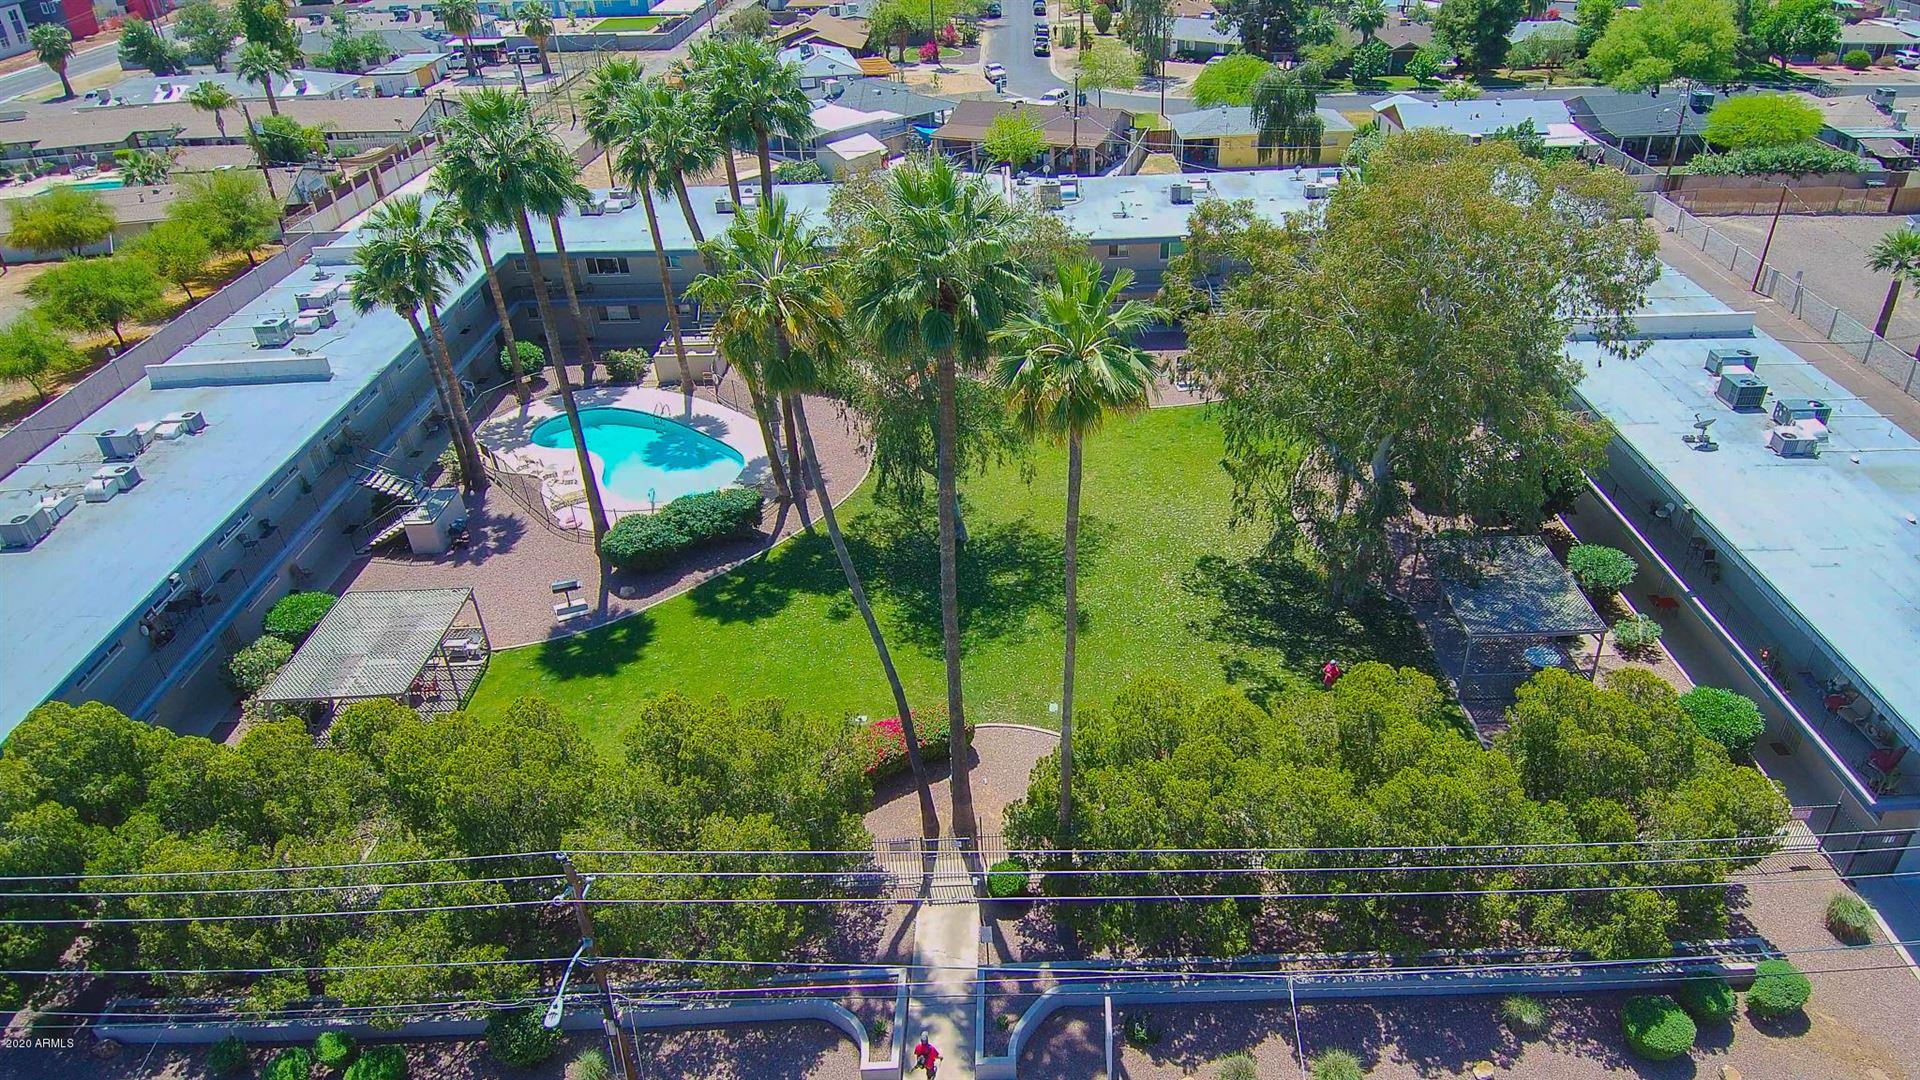 1111 E TURNEY Avenue #25, Phoenix, AZ 85014 - MLS#: 6067930